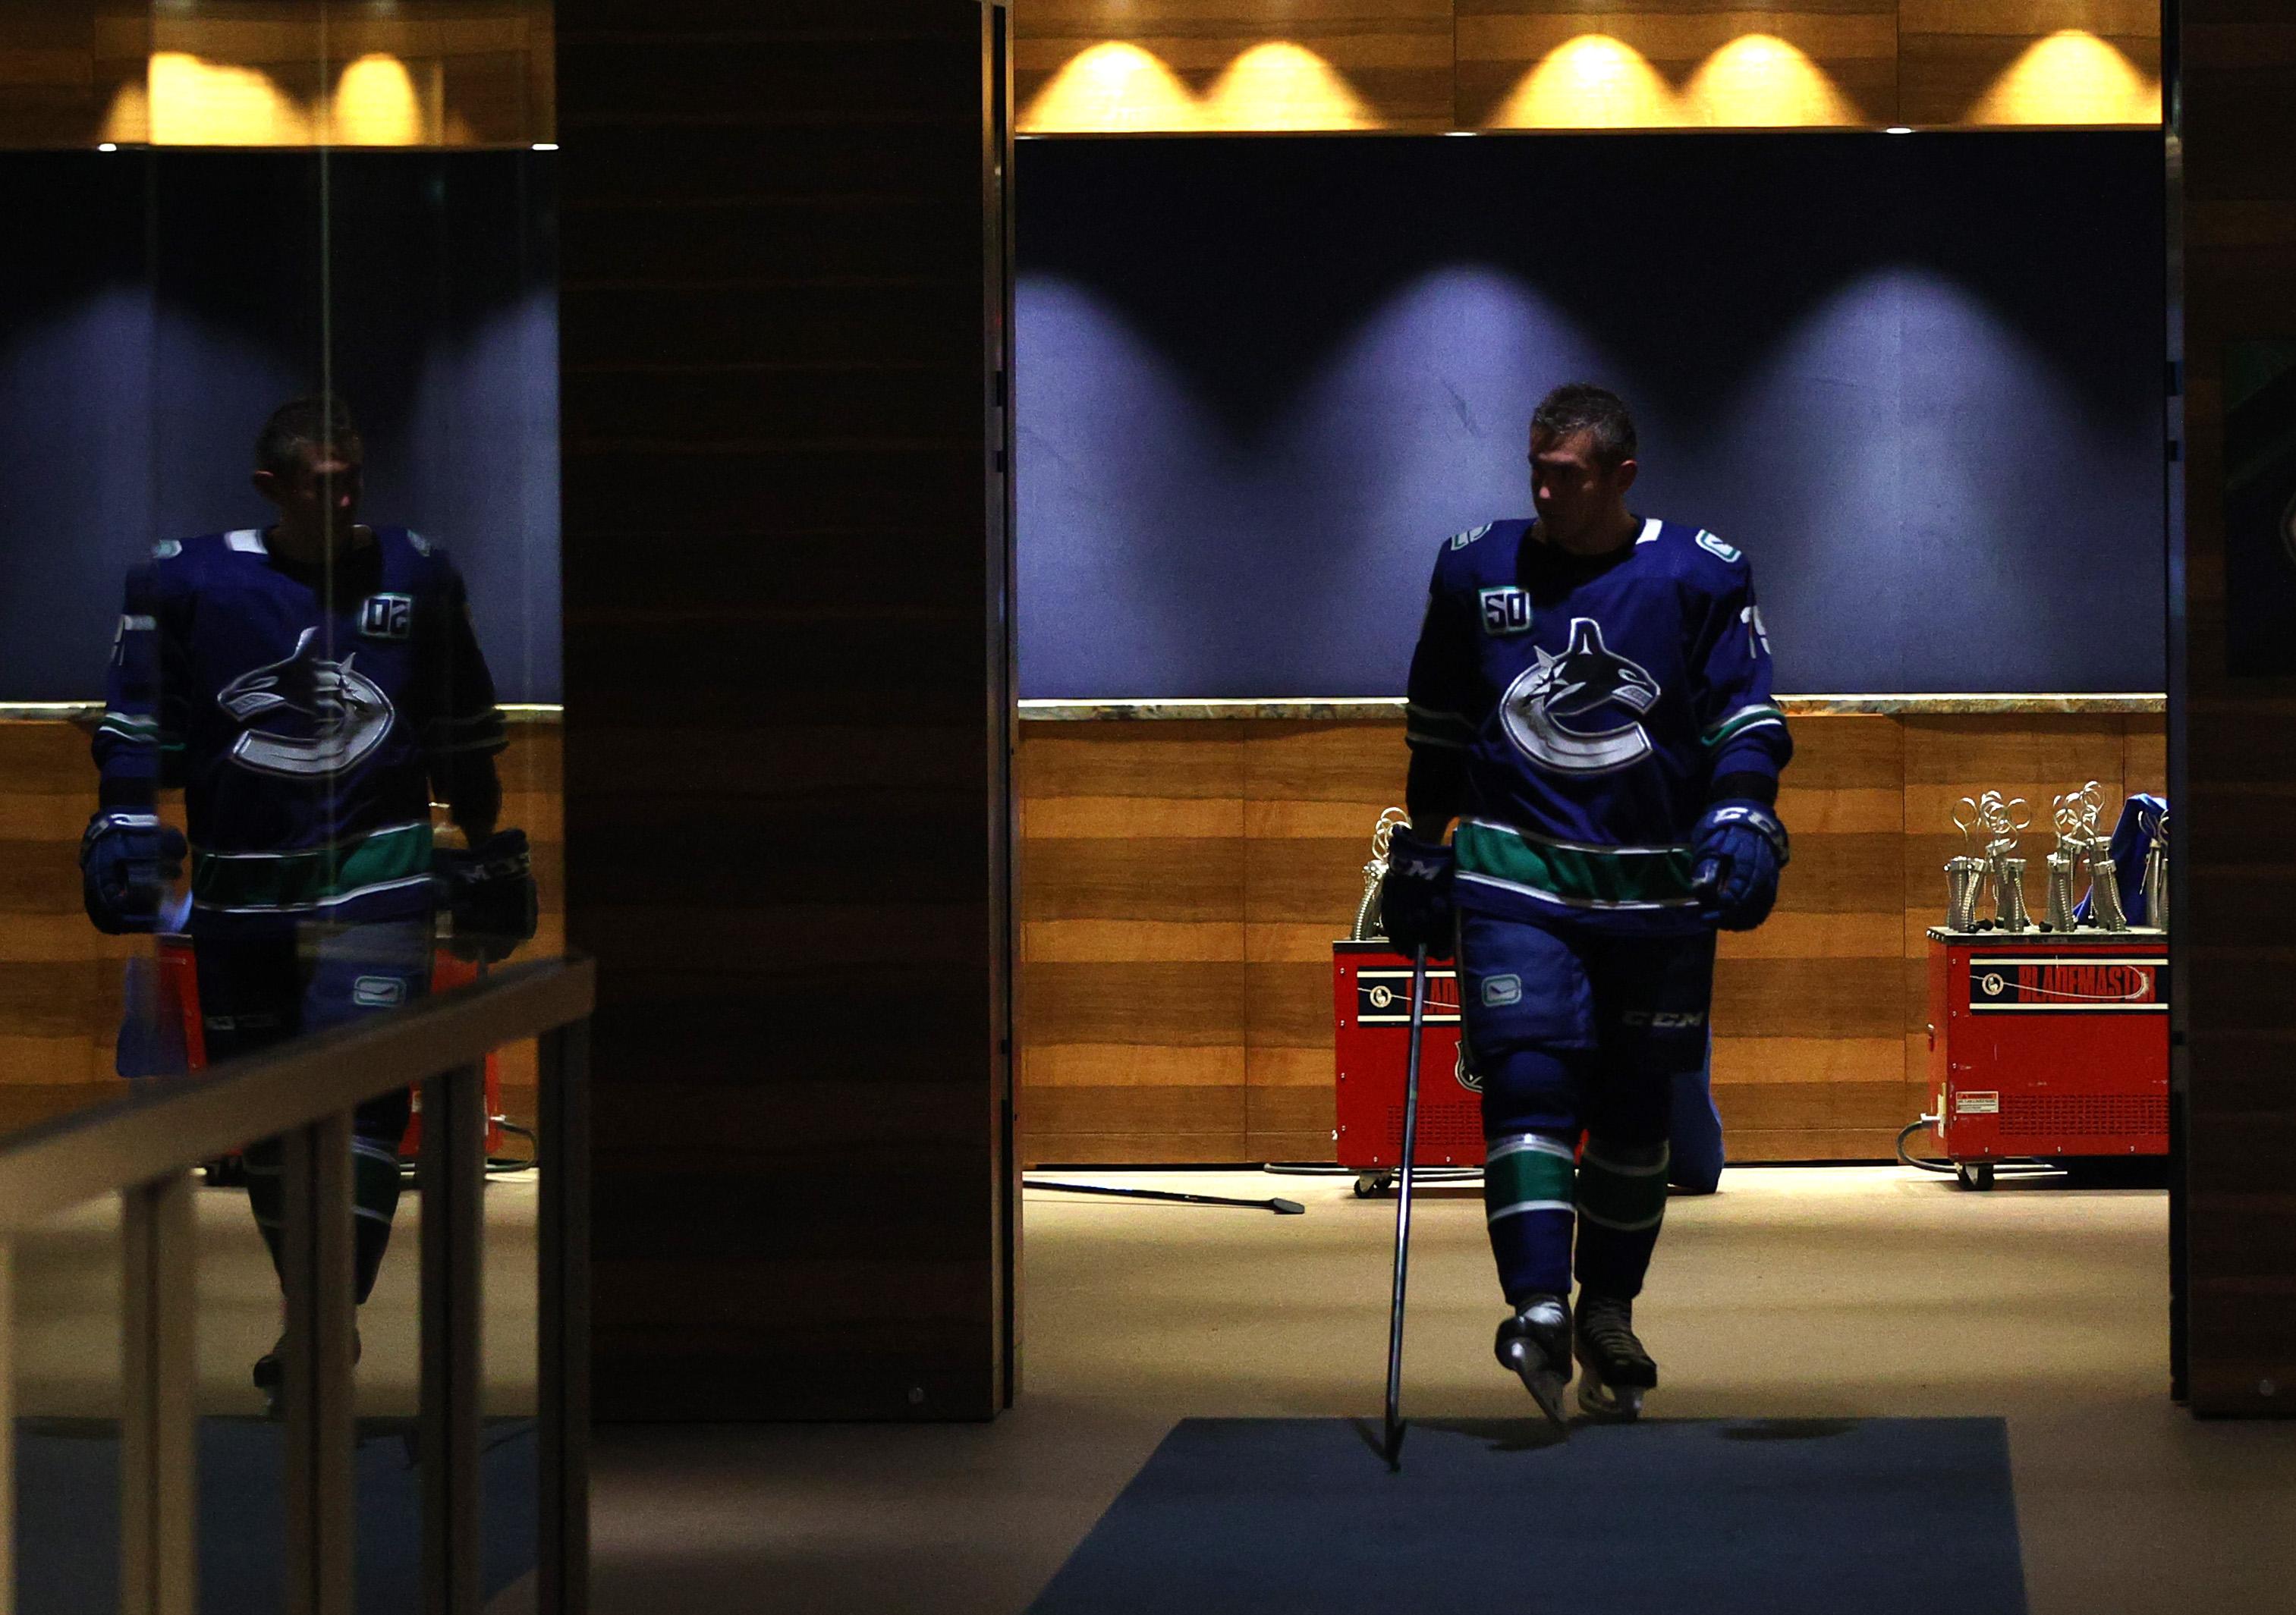 Minnesota Wild v Vancouver Canucks - Two